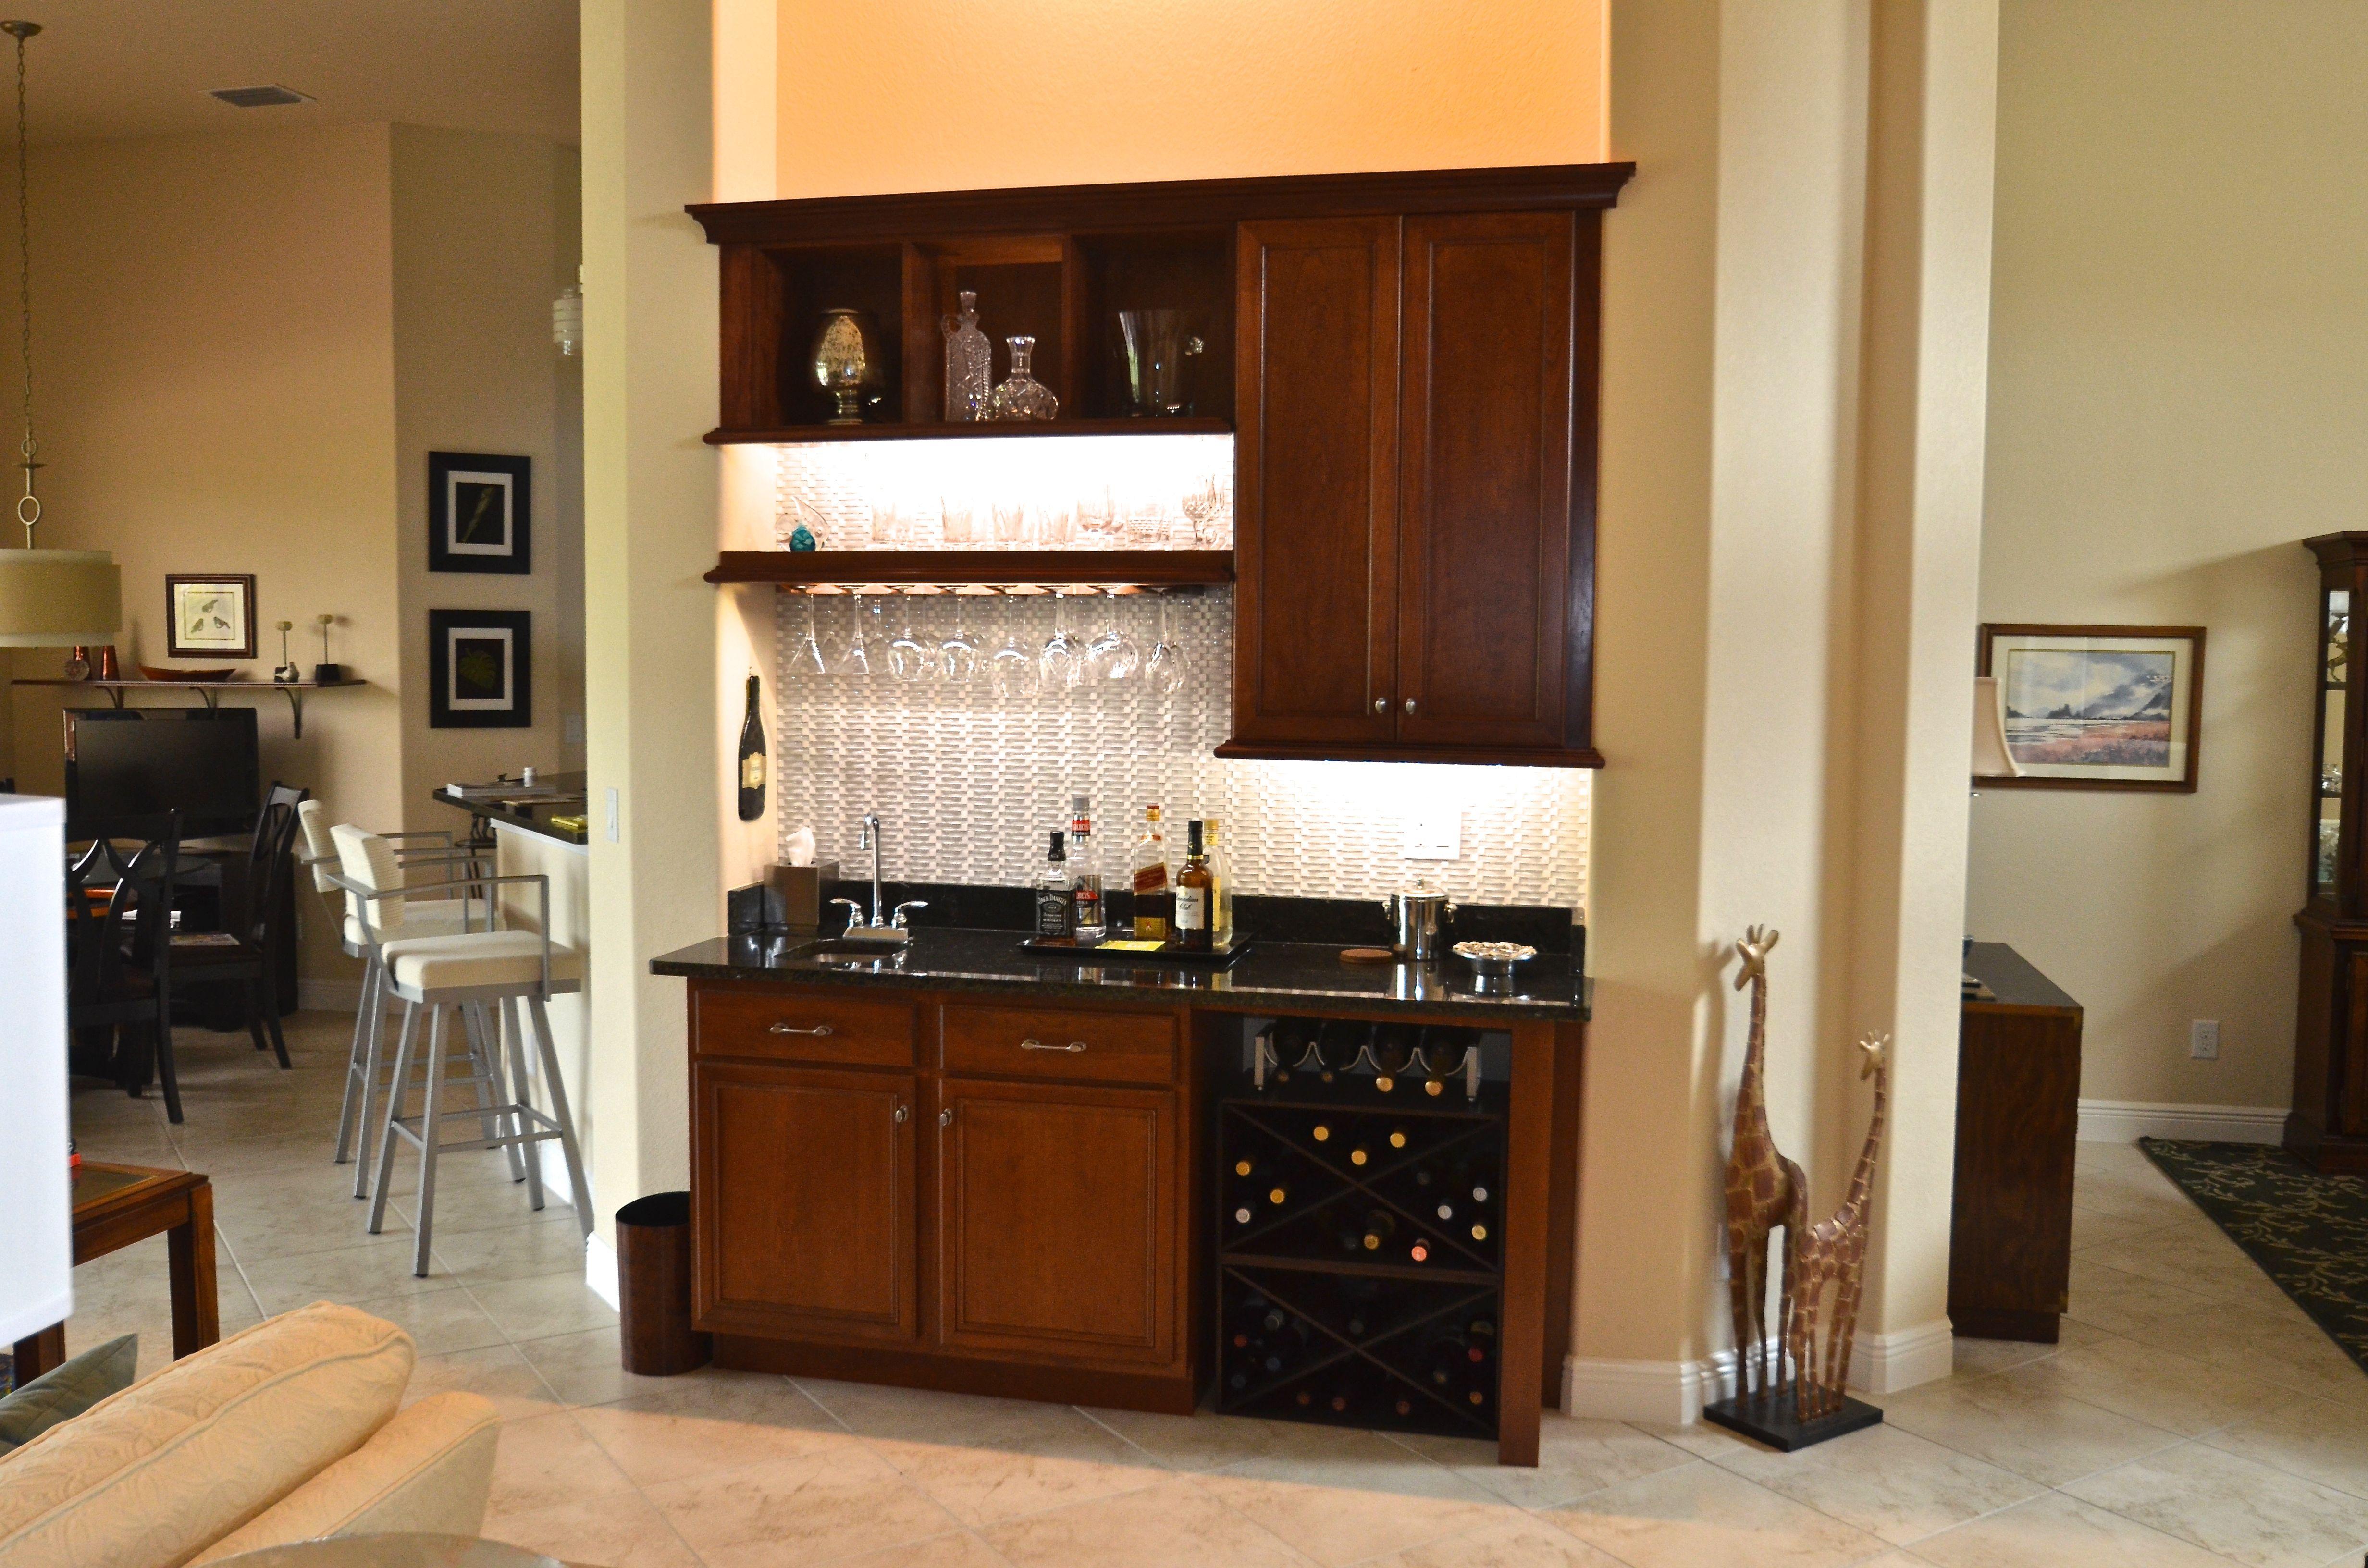 Wet Bar By Da Vinci Cabinetry In Naples Fl With Images Kitchen And Bath Remodeling Kitchen Design Cabinet Design